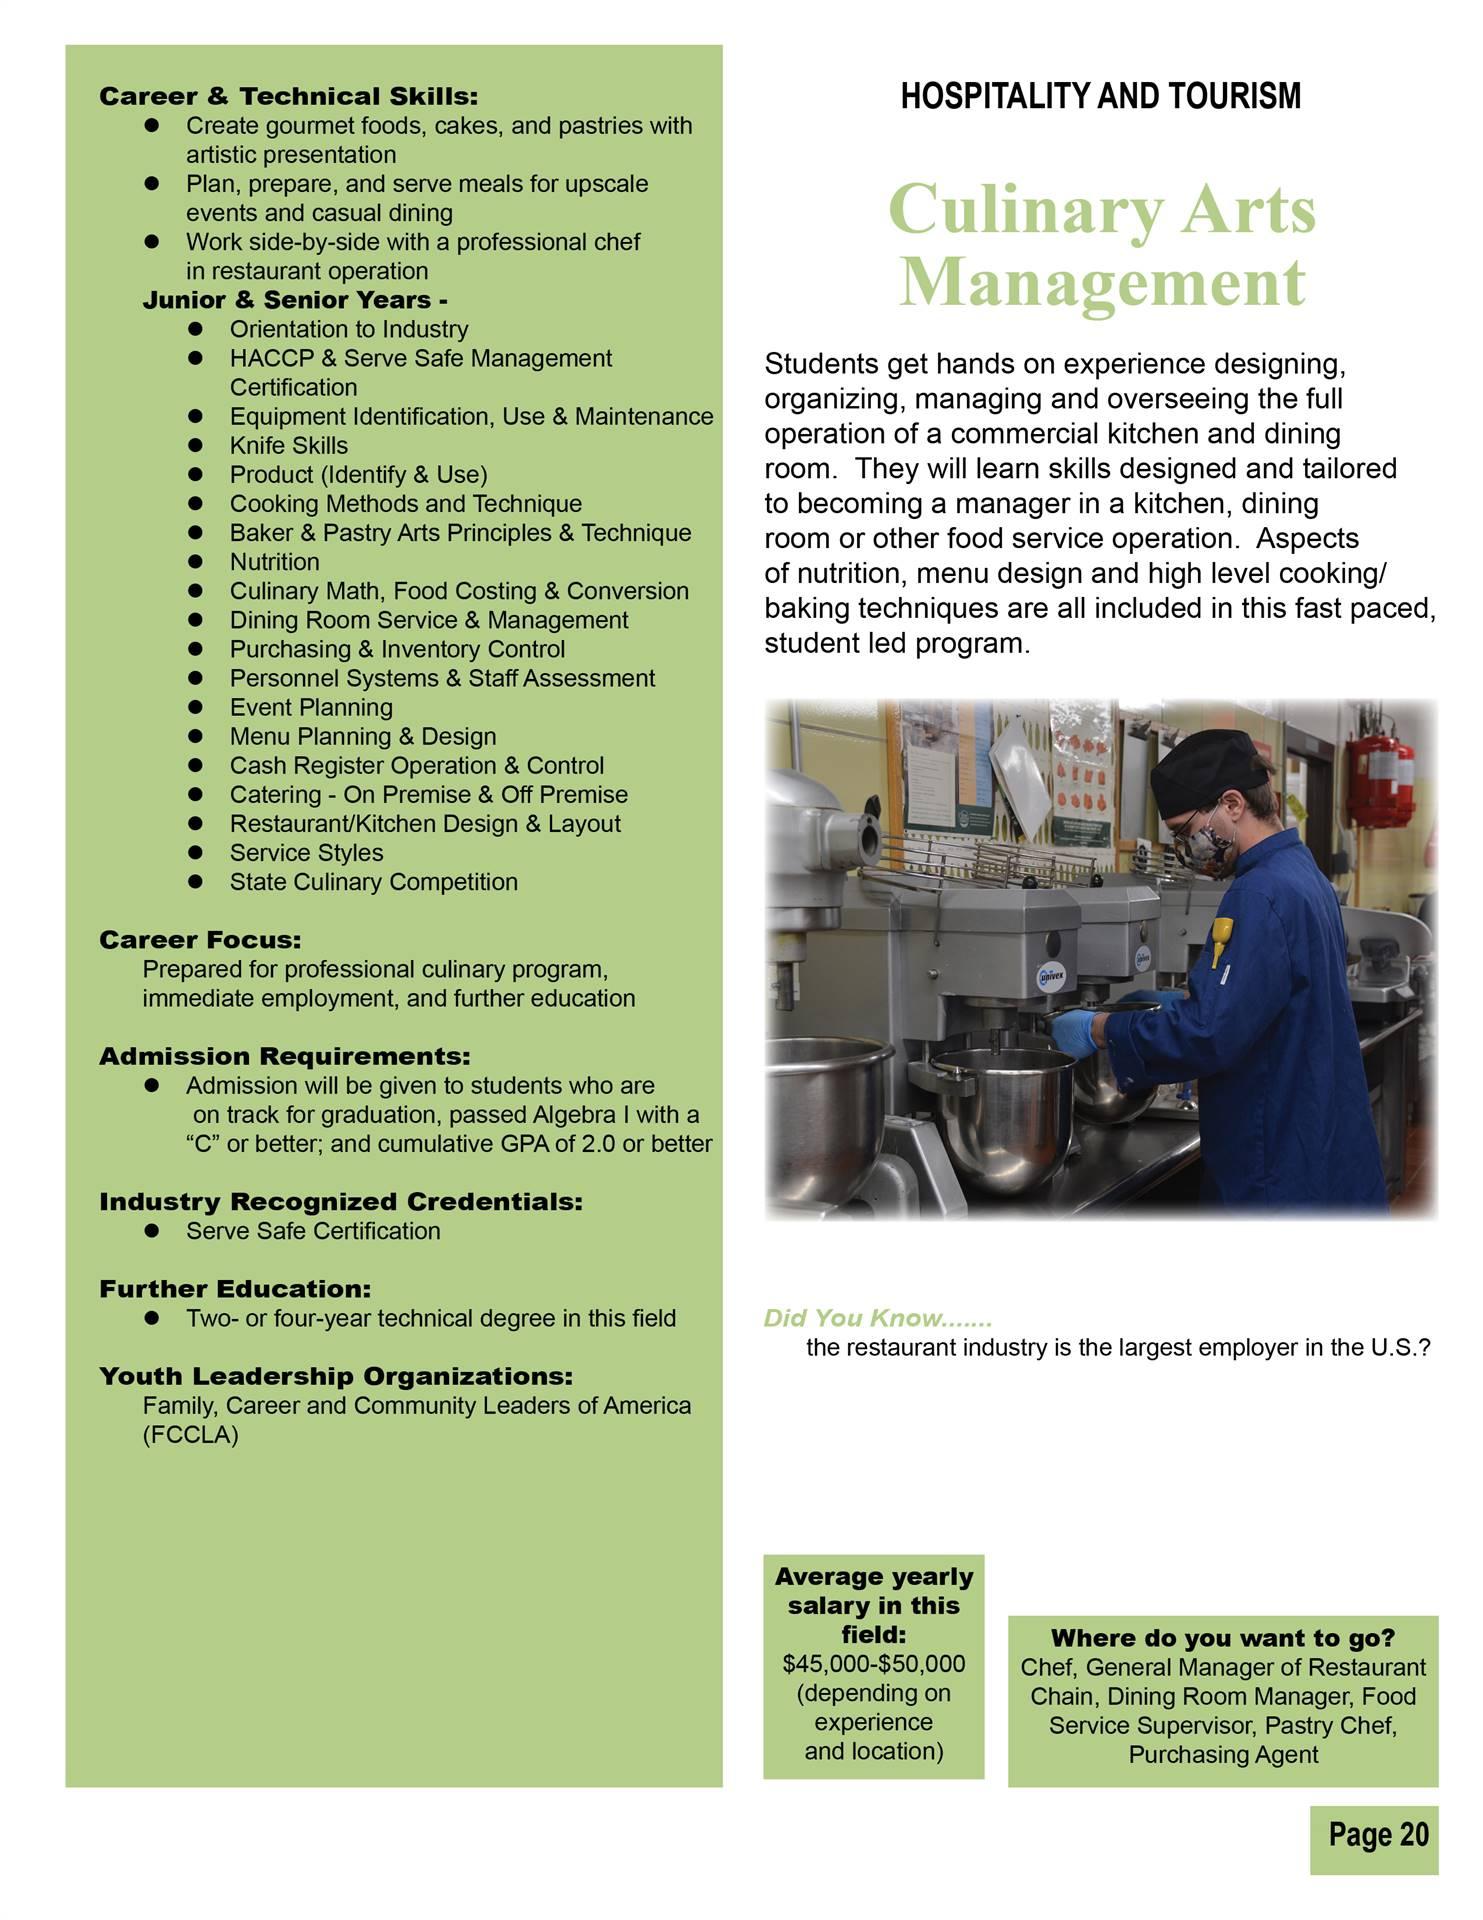 Culinary Arts Management